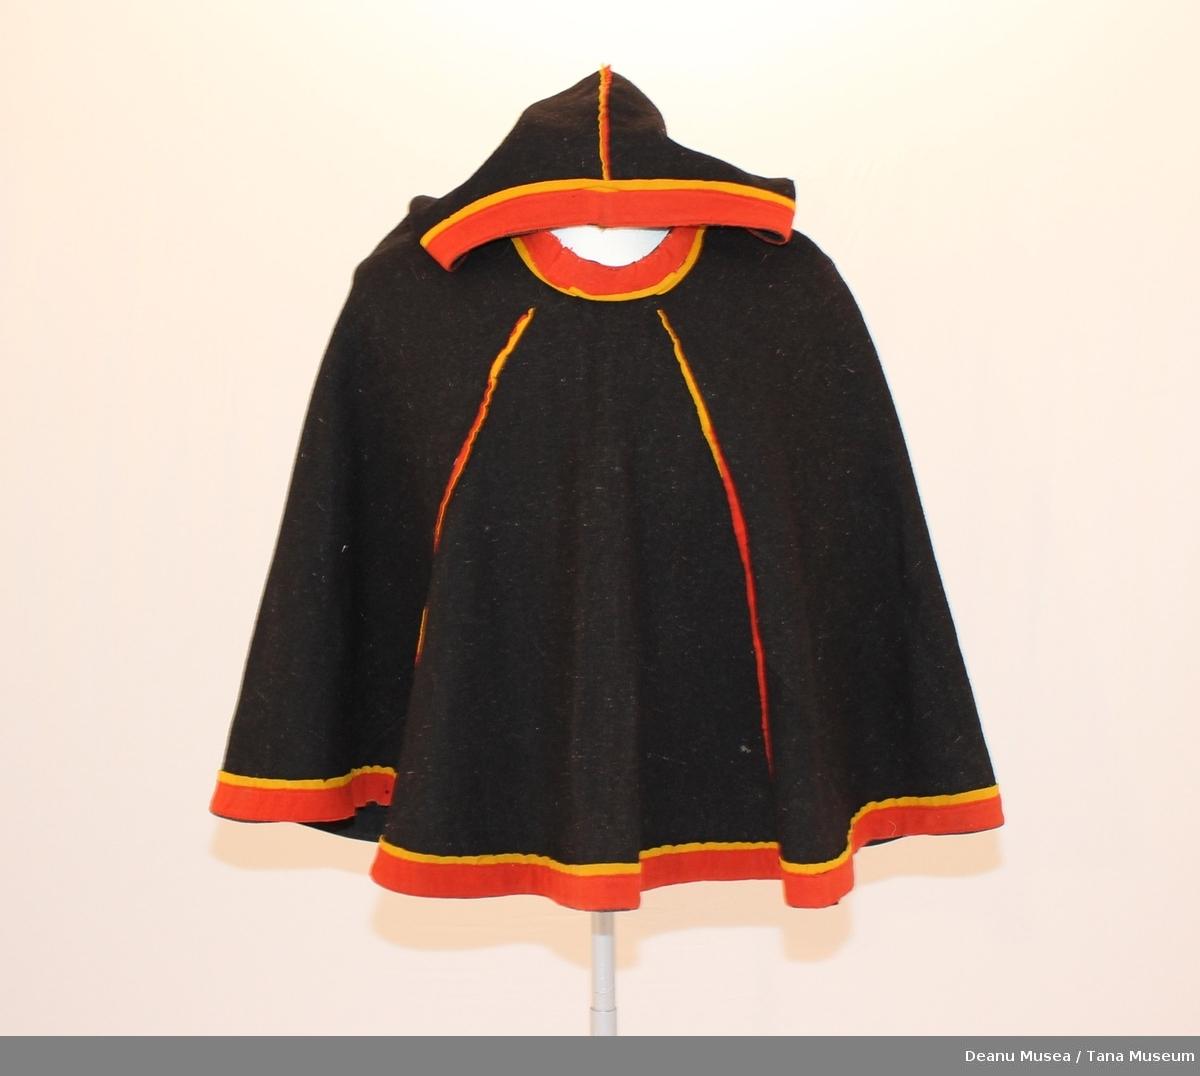 Luhkka i sort klede med rød og gul kantkleder.